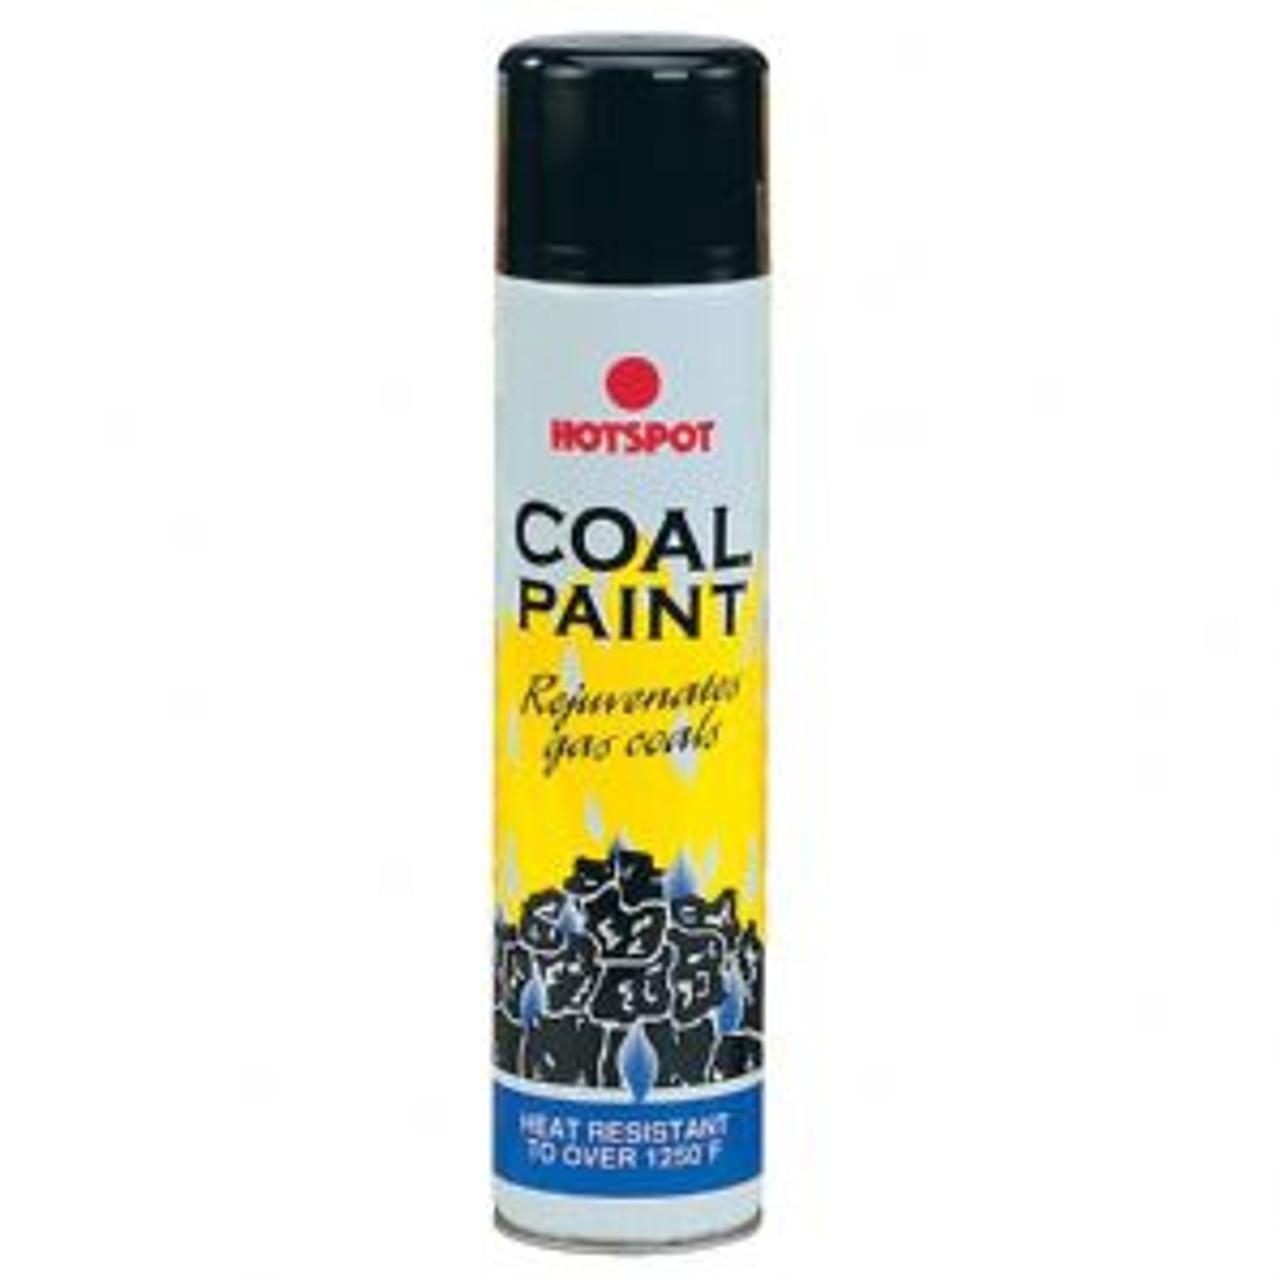 Hotspot Coal Paint